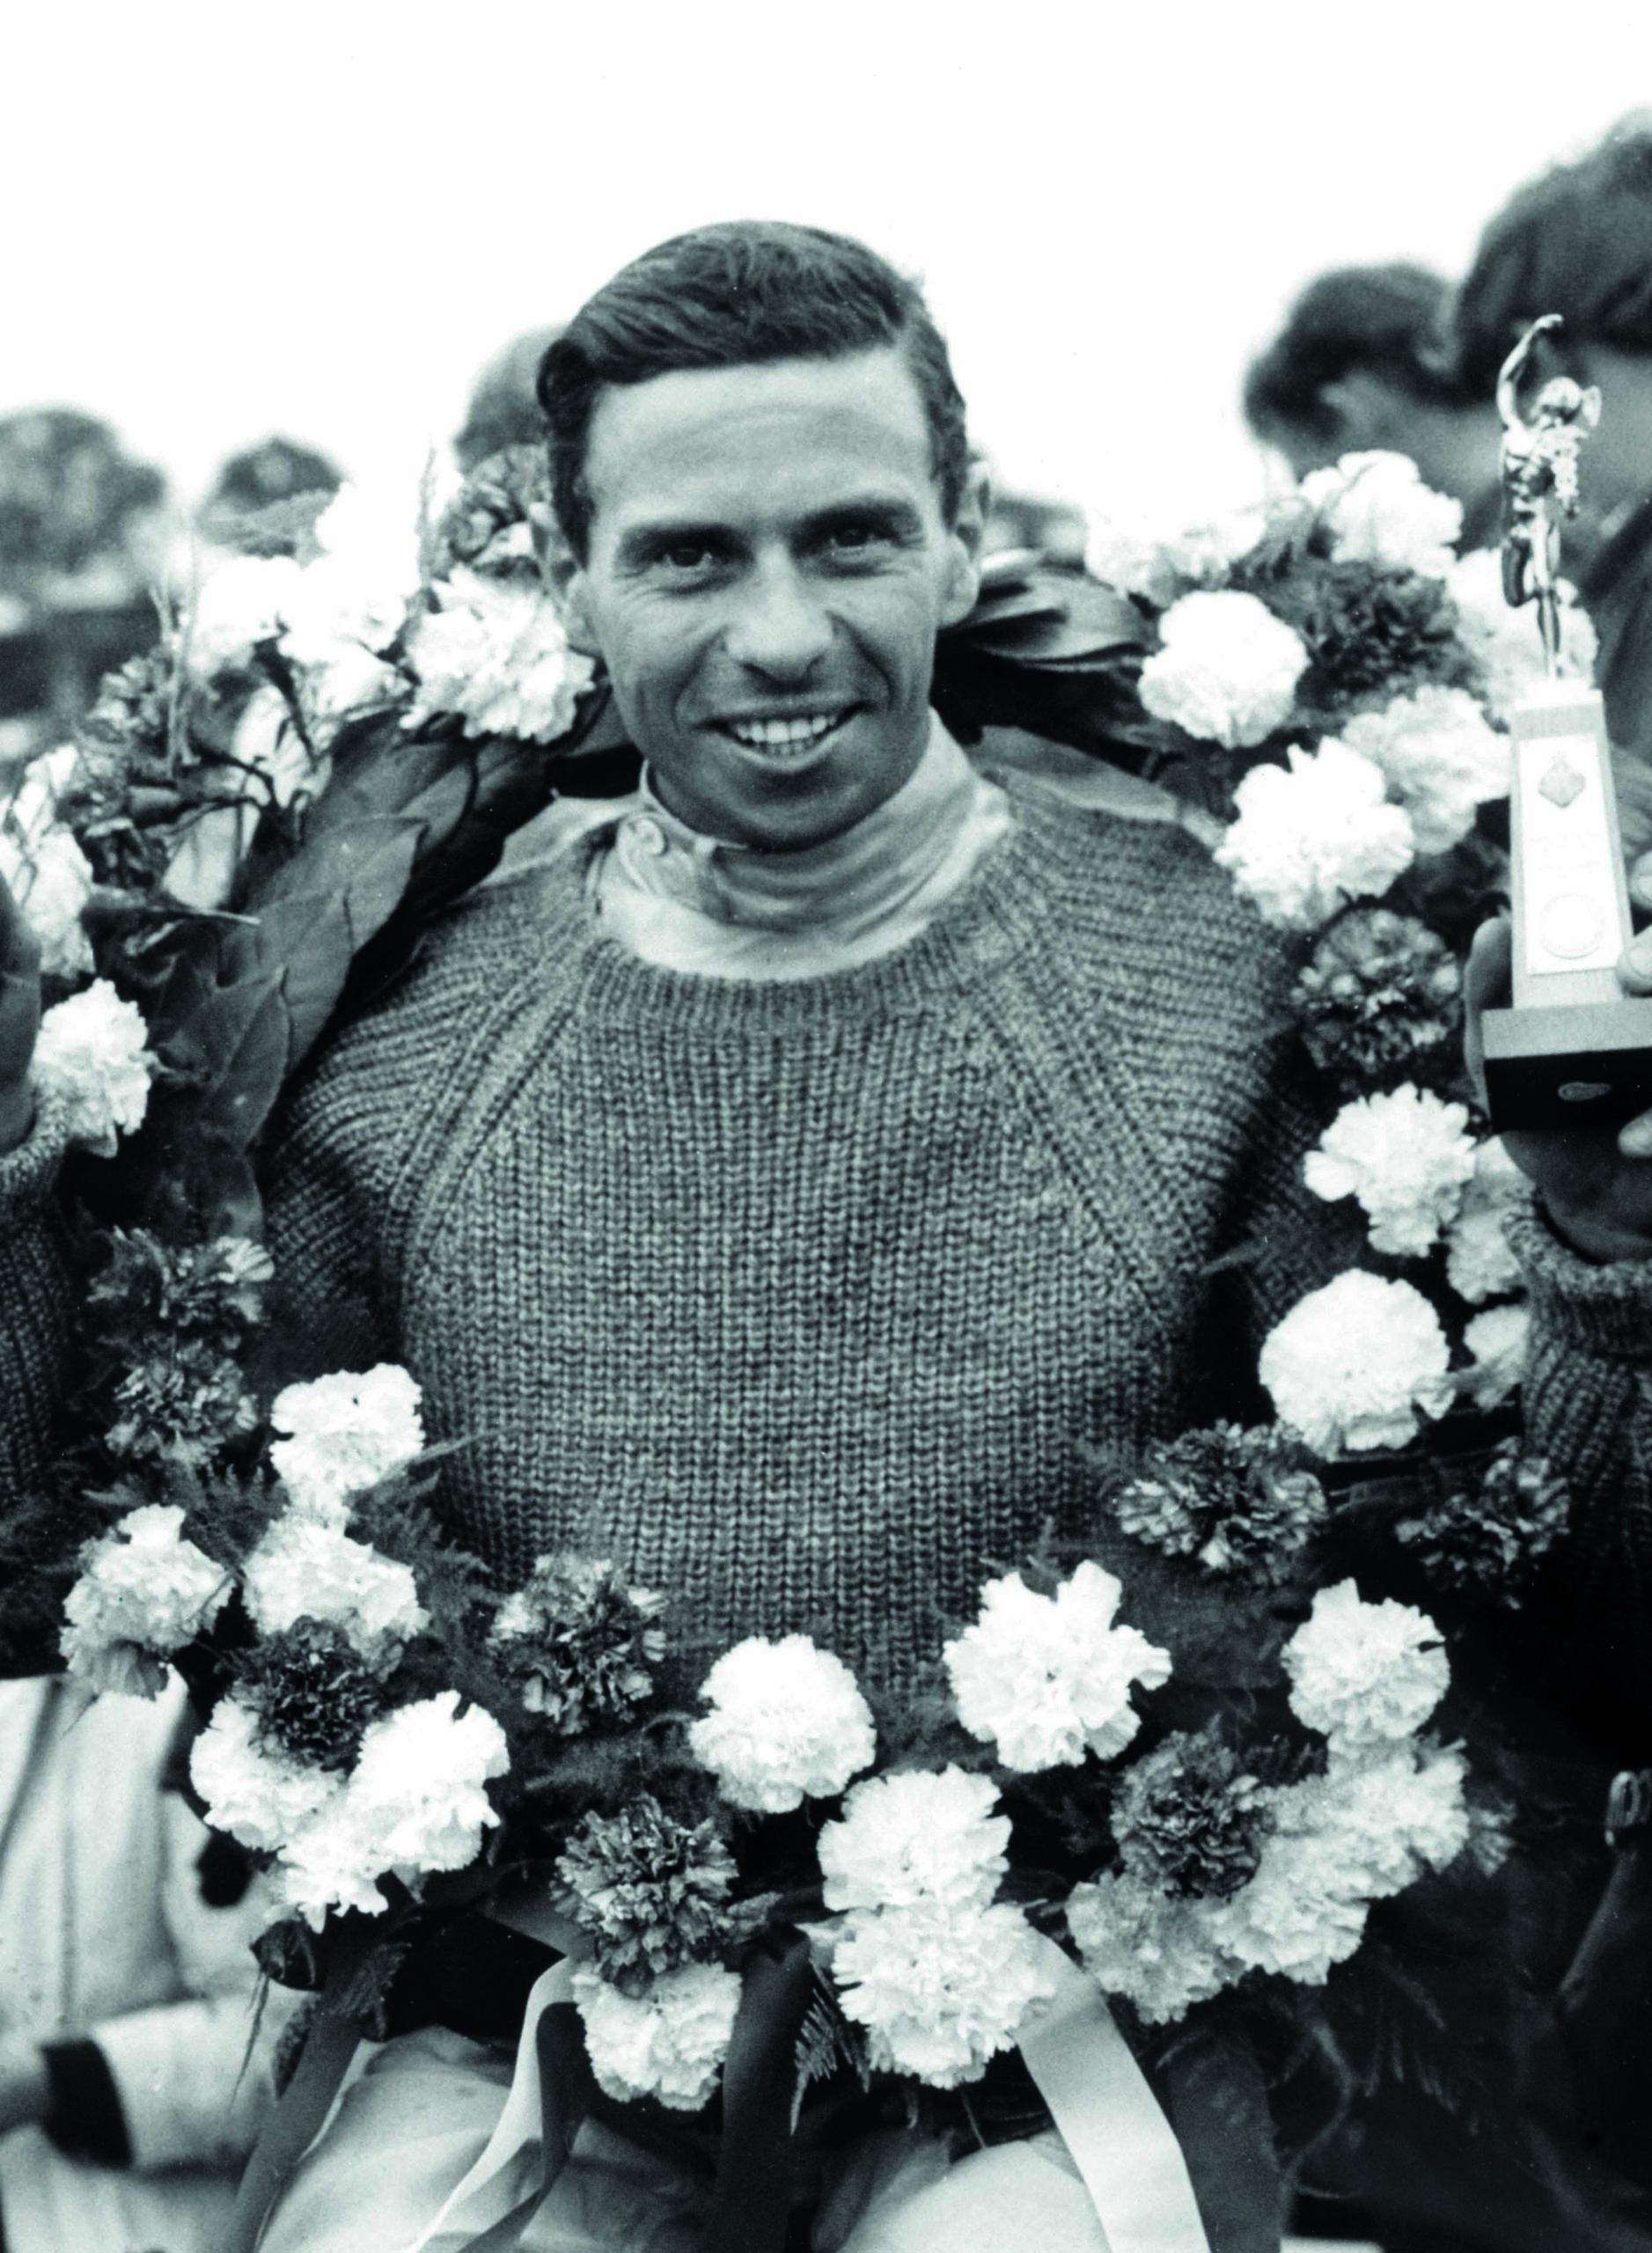 Jim-Clark-celebrates-winning-the-1965-British-Grand-Prix-at-Silverstone-with-a-garland-around-his-neck